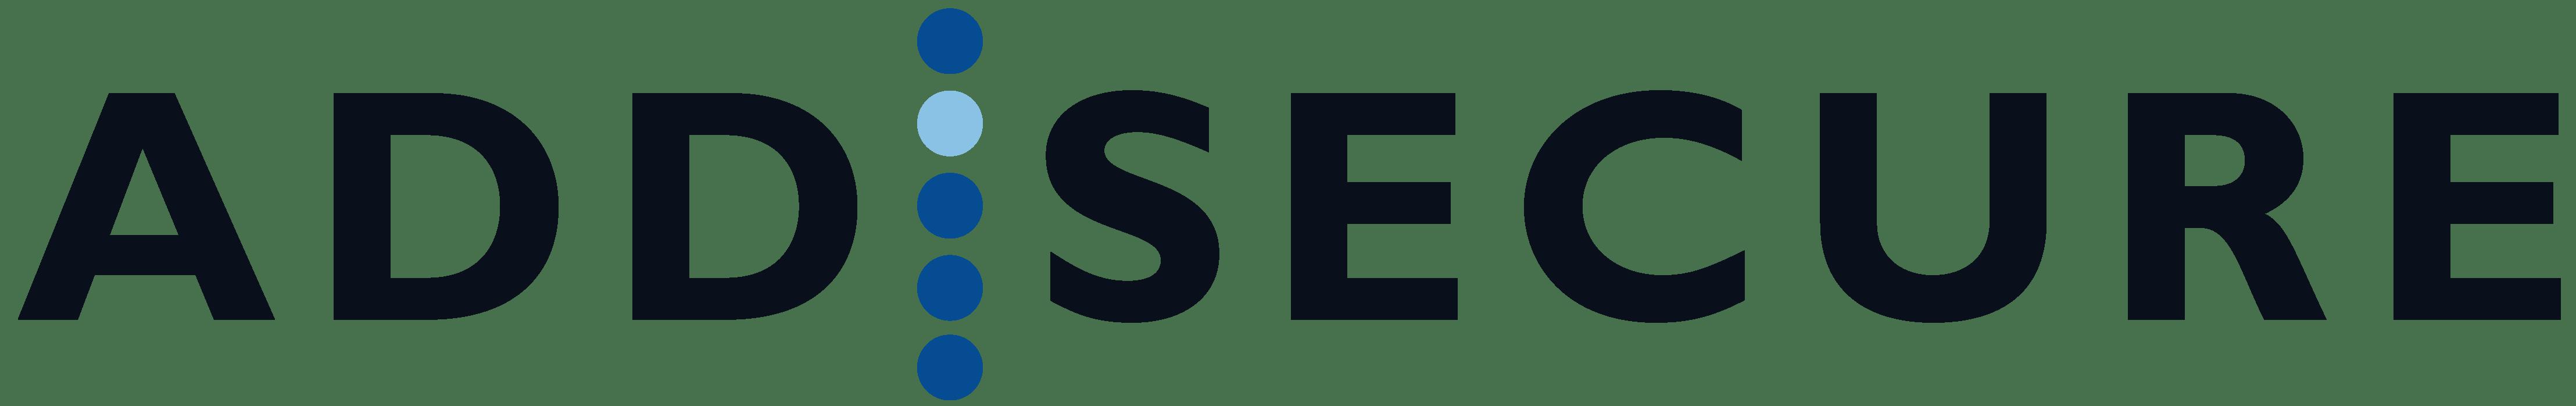 AddSecure (original)